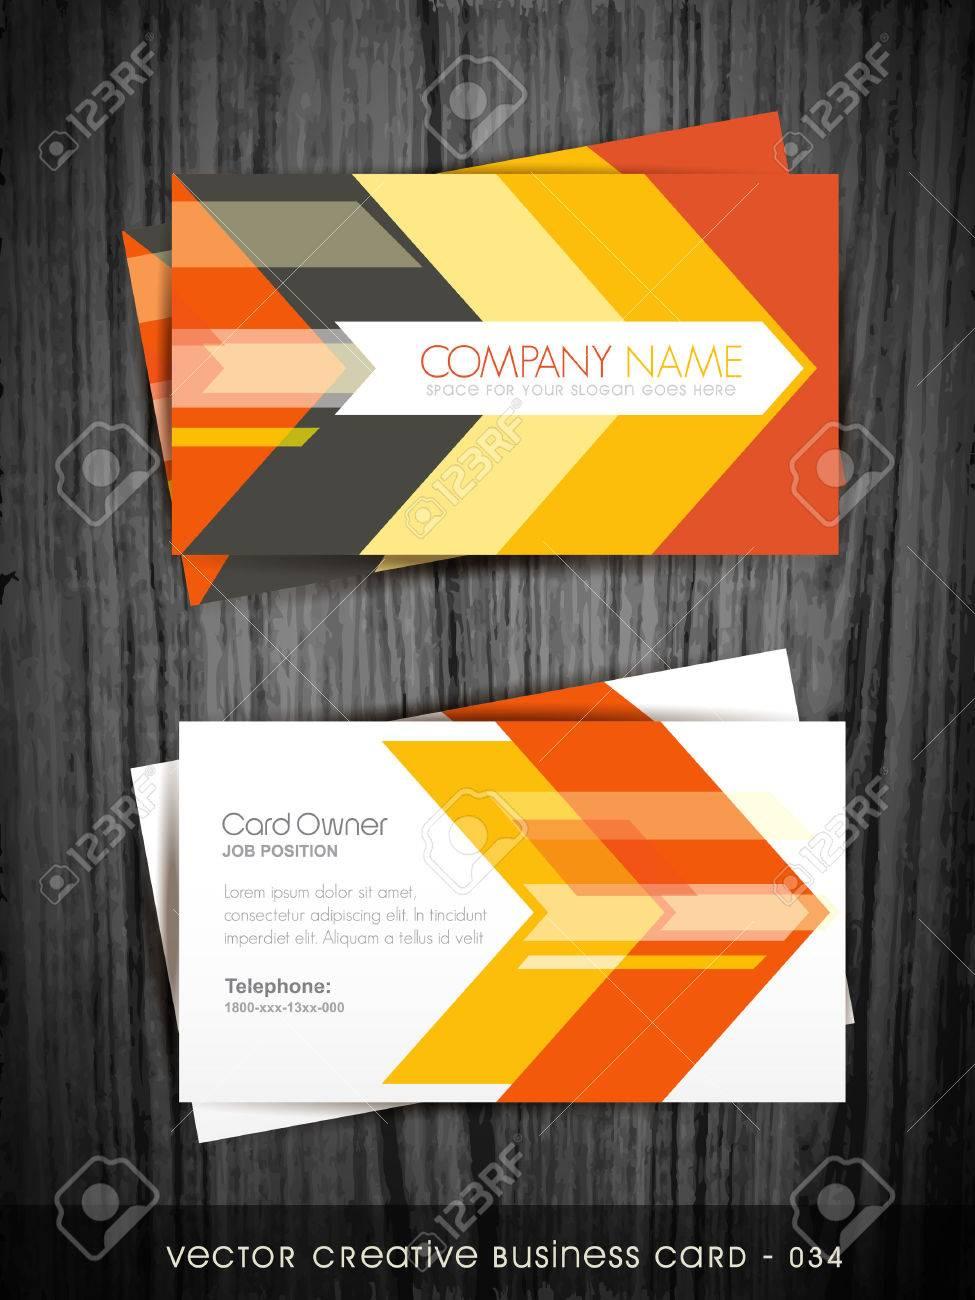 Arrow style business card vector design royalty free cliparts arrow style business card vector design stock vector 27376638 reheart Images